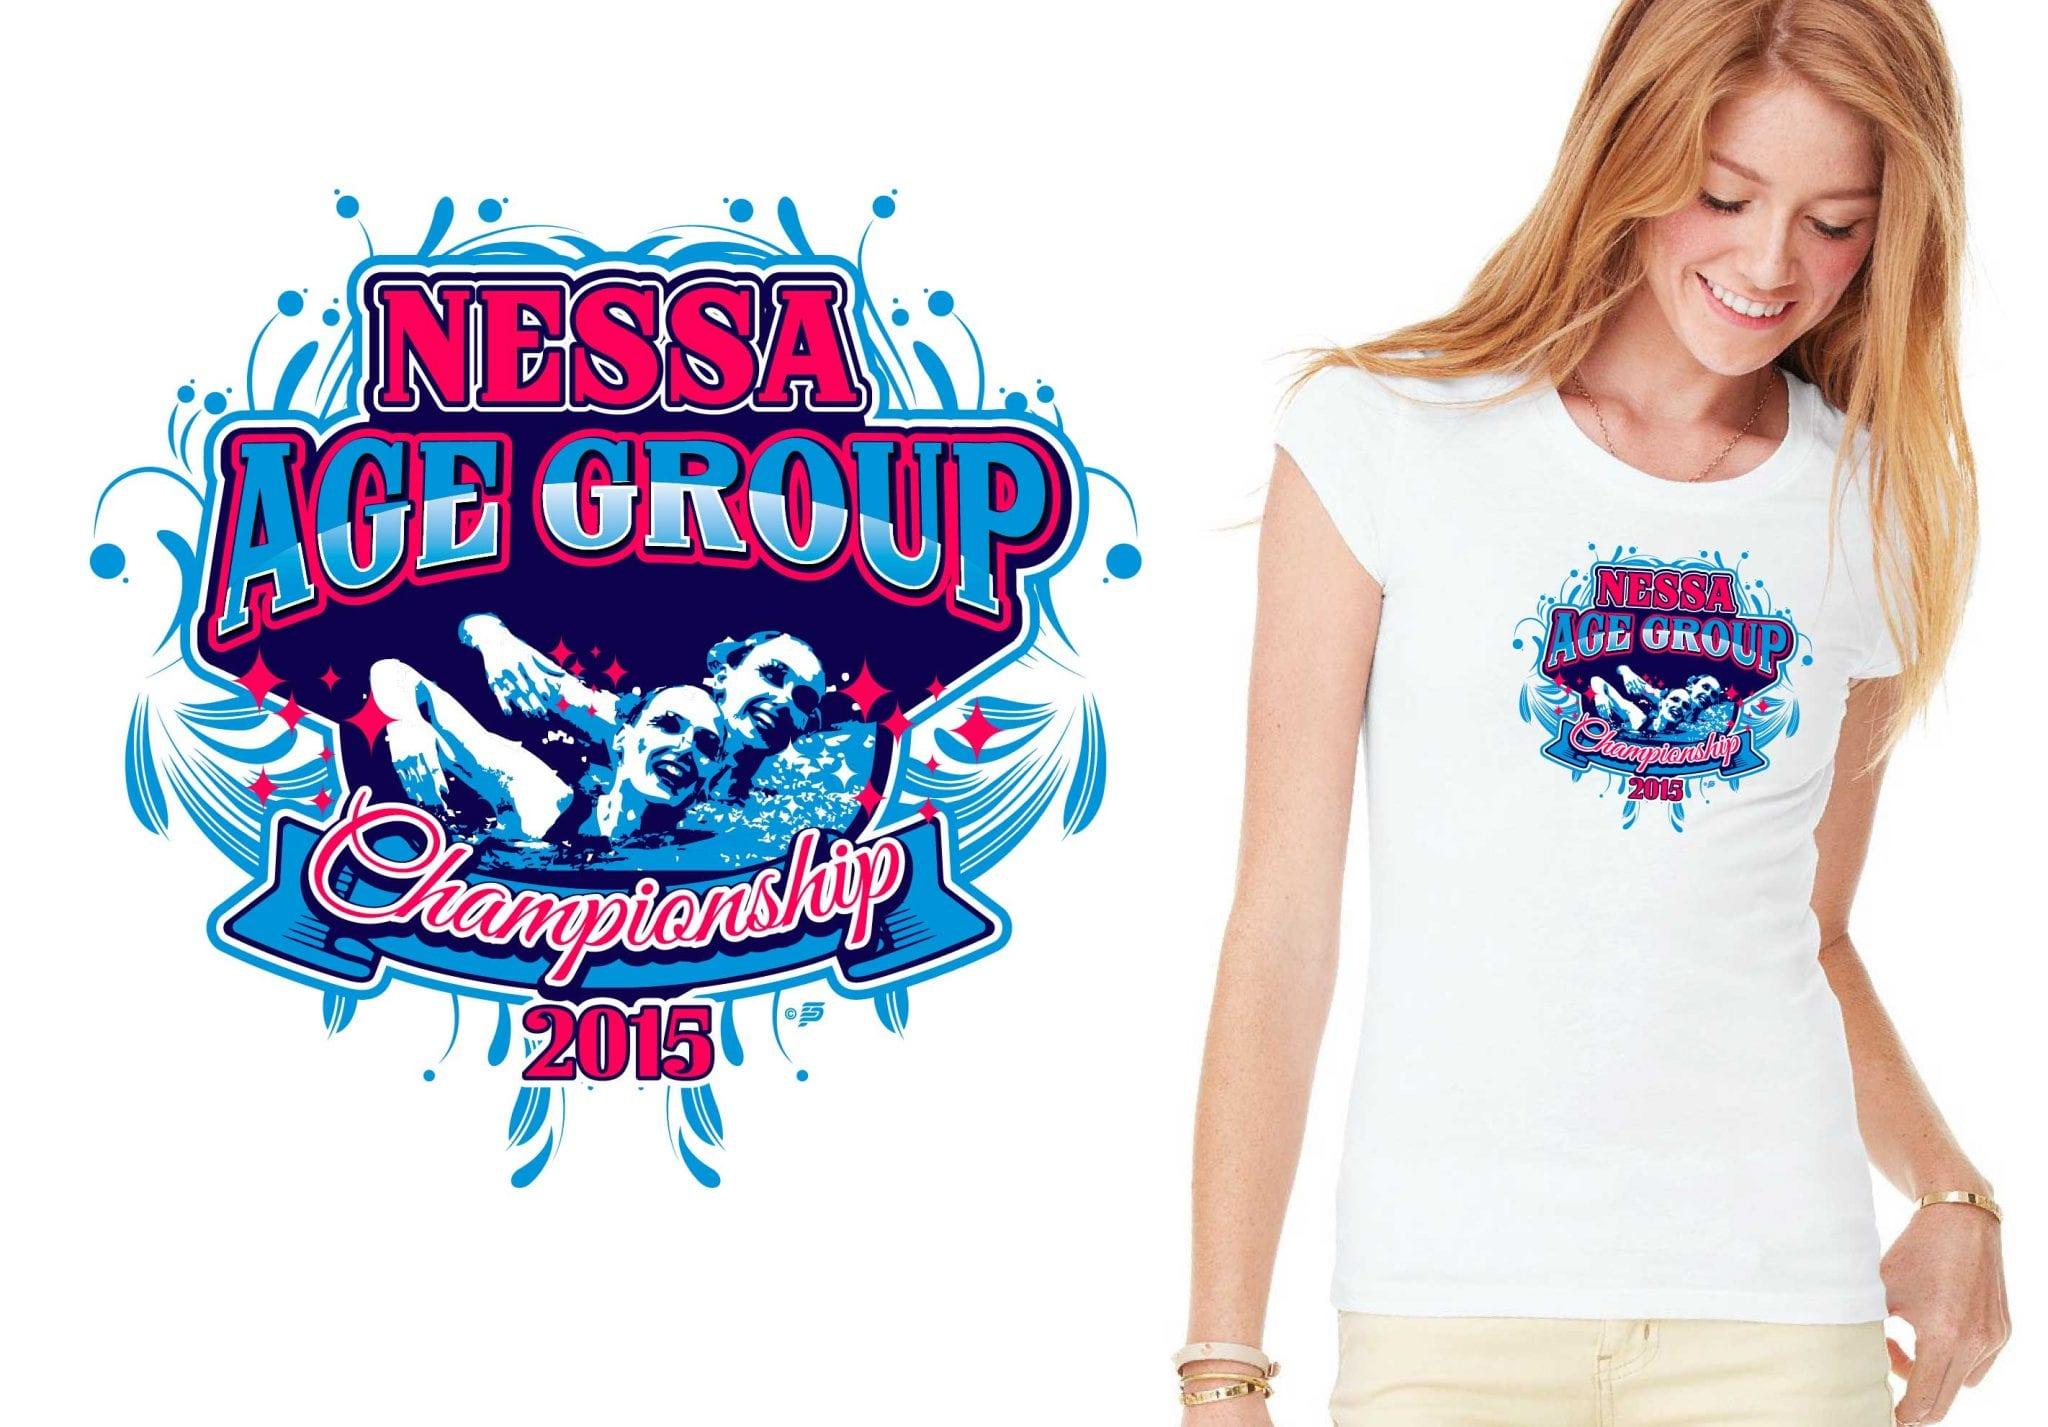 2015 NESSA AGE GROUP CHAMPIONSHIP PRINT READY